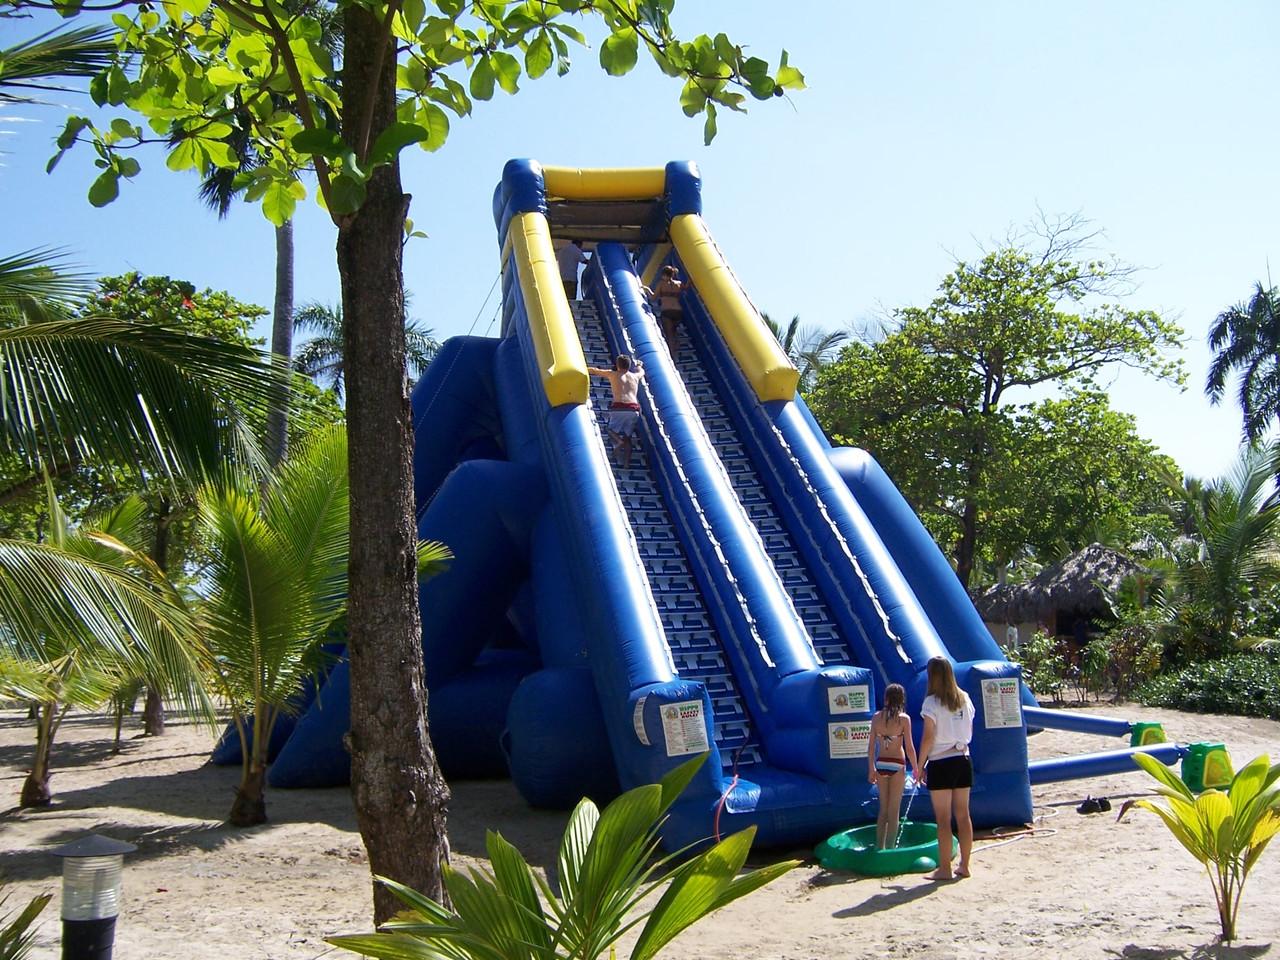 FreeStyle Hippo Slide